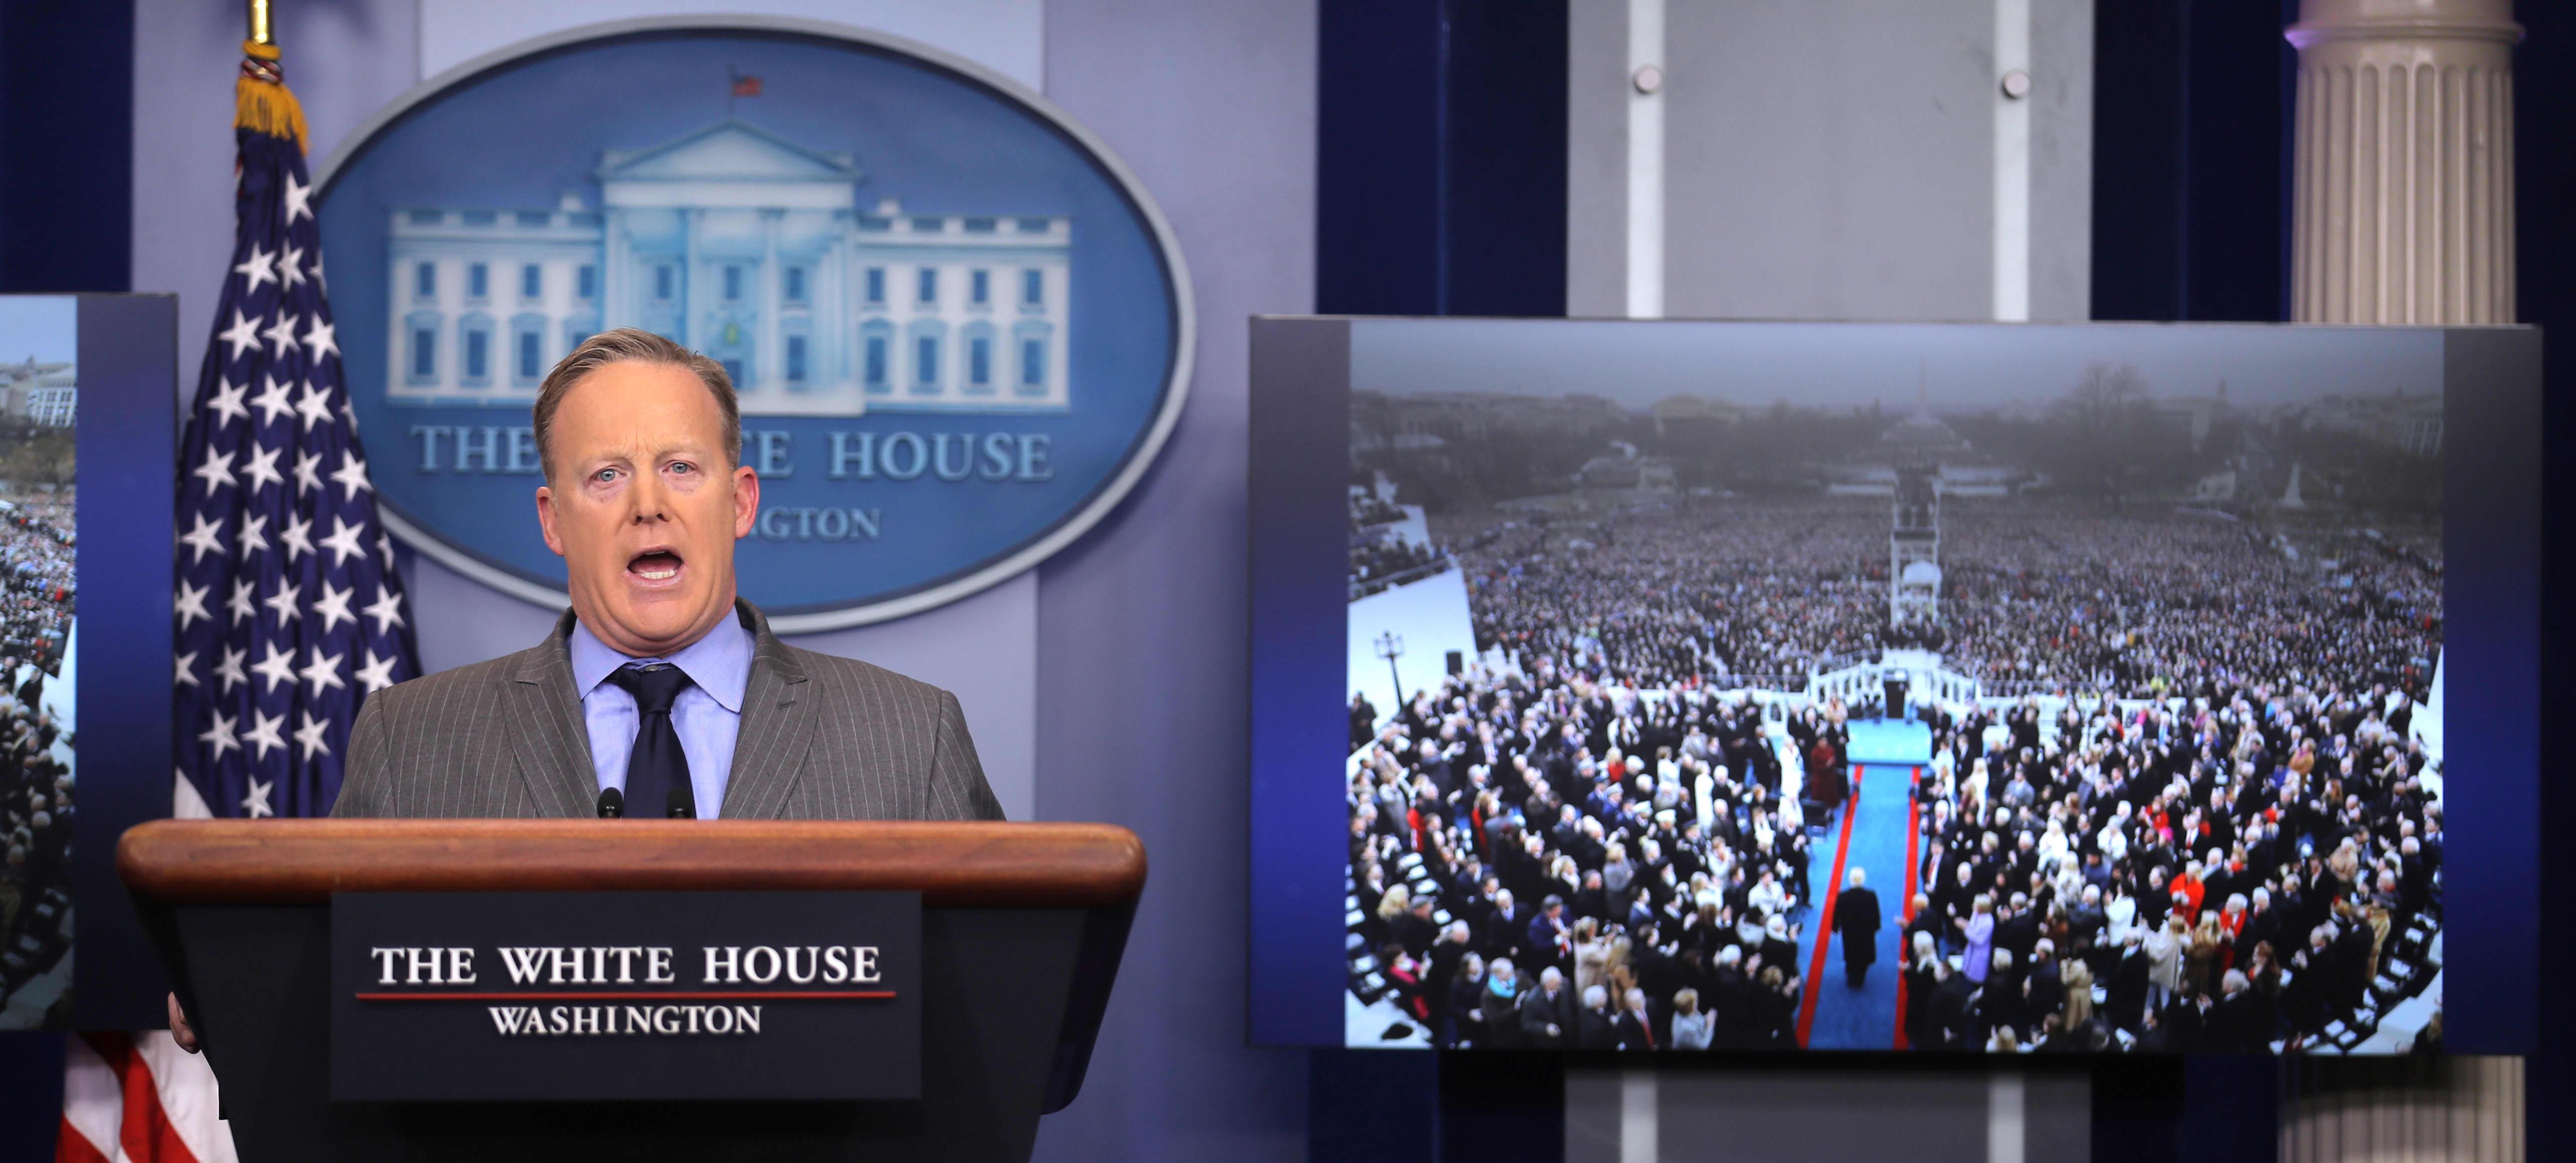 white house press secretary sean spicer rips media for 'false